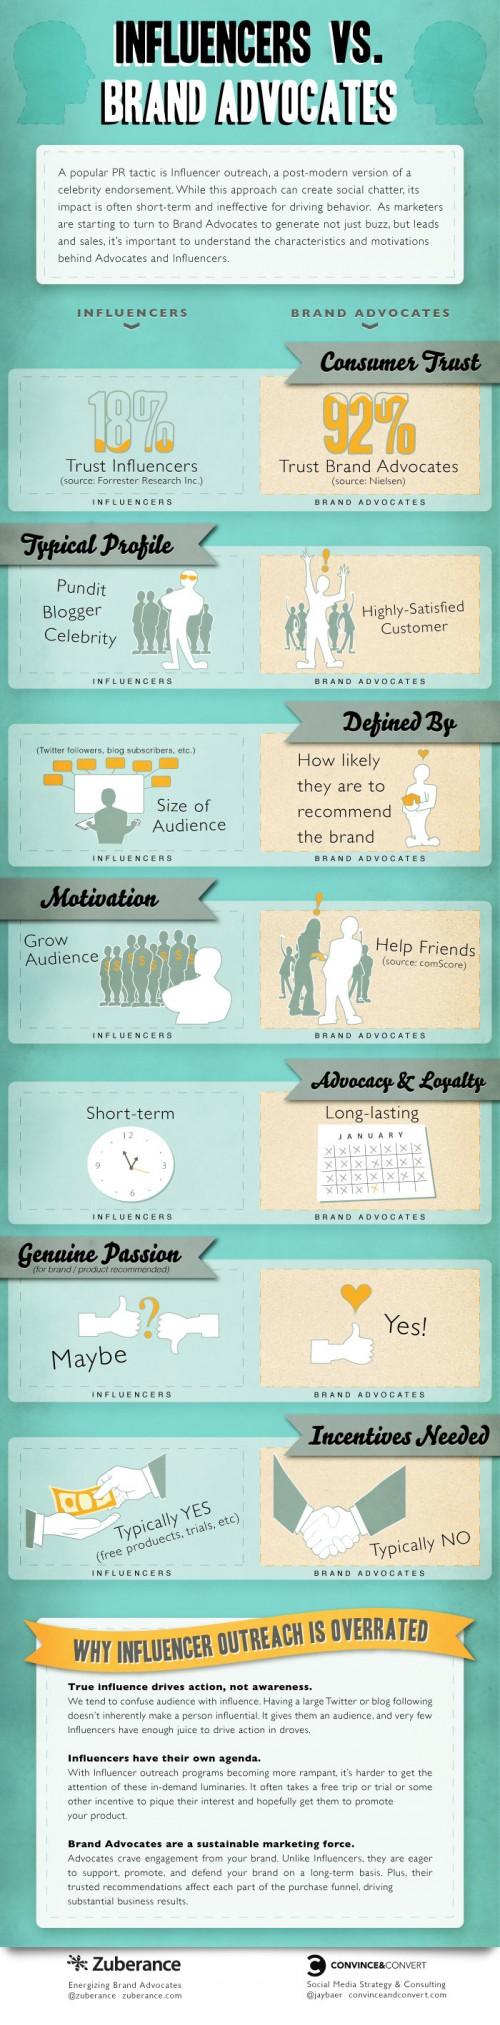 Brand Influencers vs. Brand Advocates